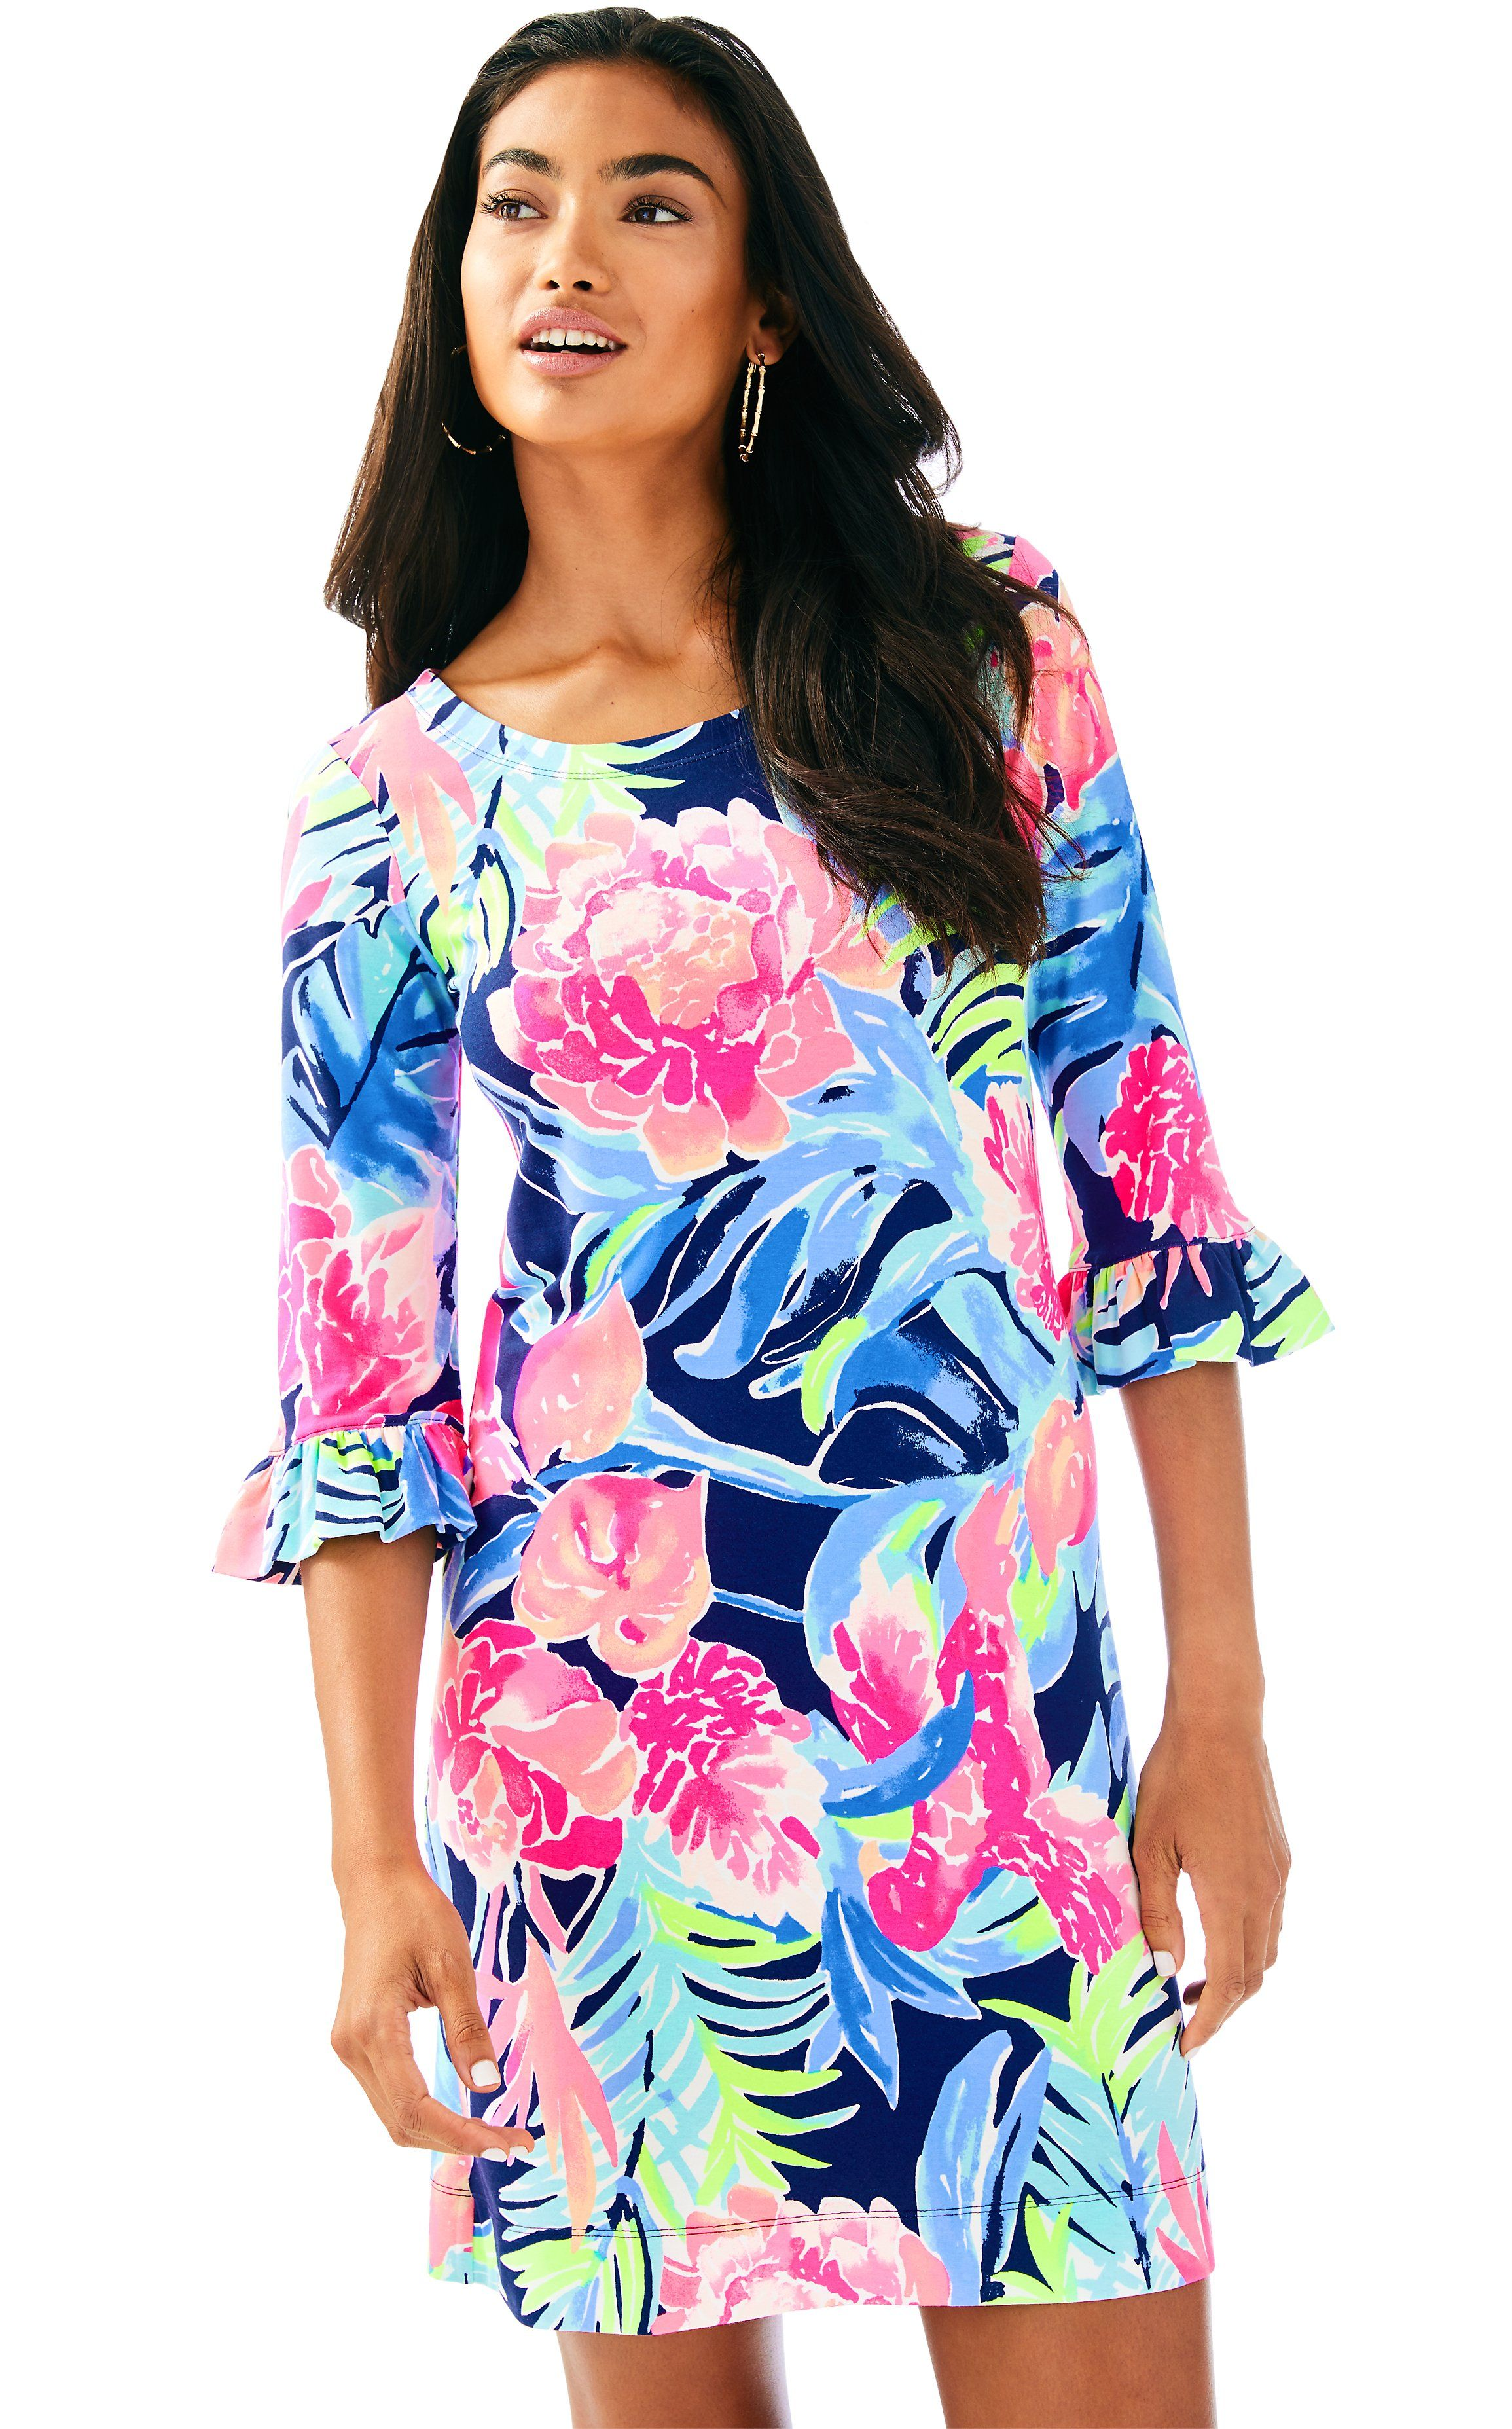 20cffce82b51ca UPF 50+ Sophie Ruffle Dress in High Tide Navy Tropicolada | Lilly ...